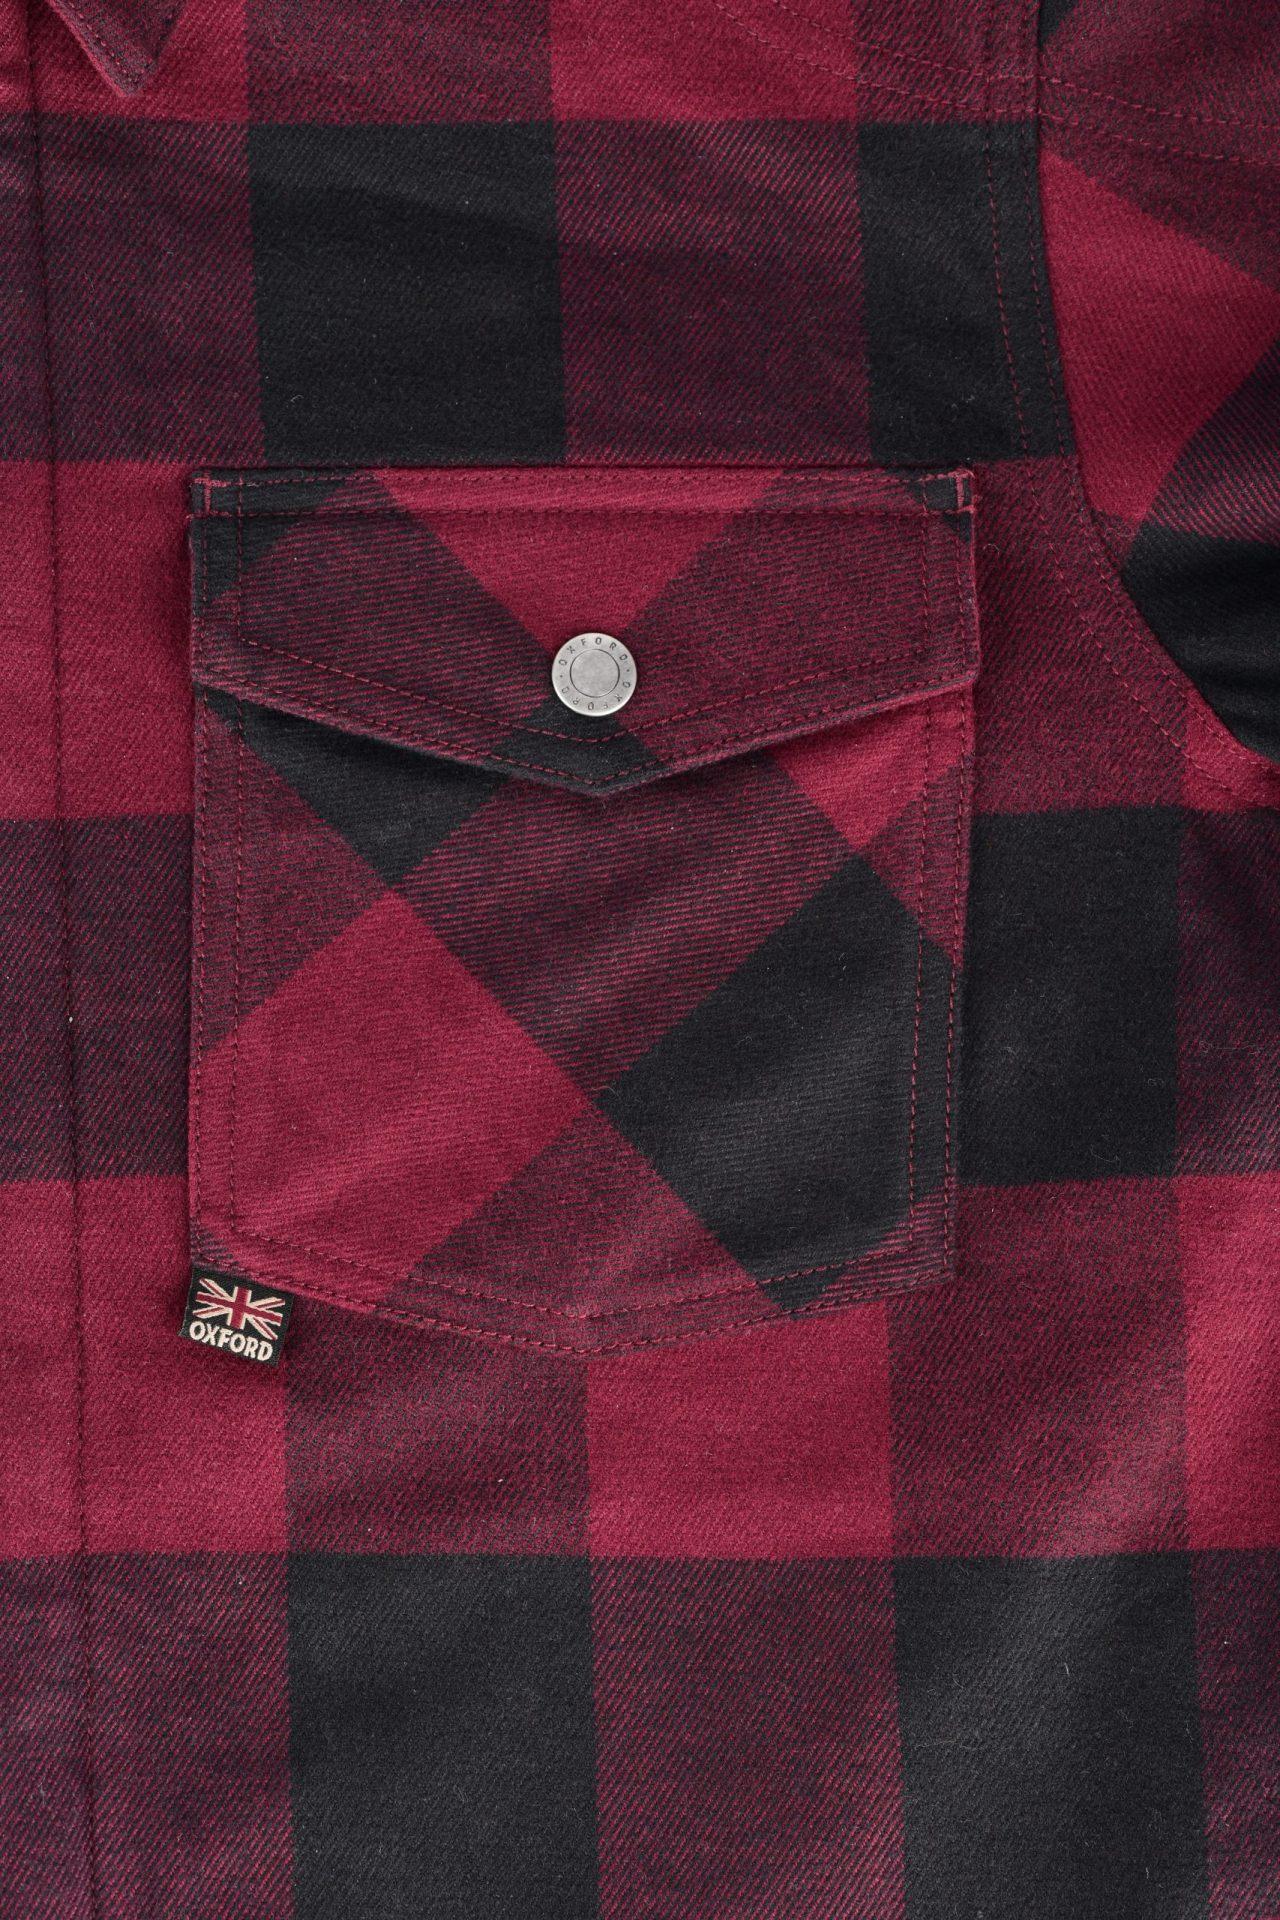 Kickback_Detail_3-scaled Kickback 2.0 Shirt